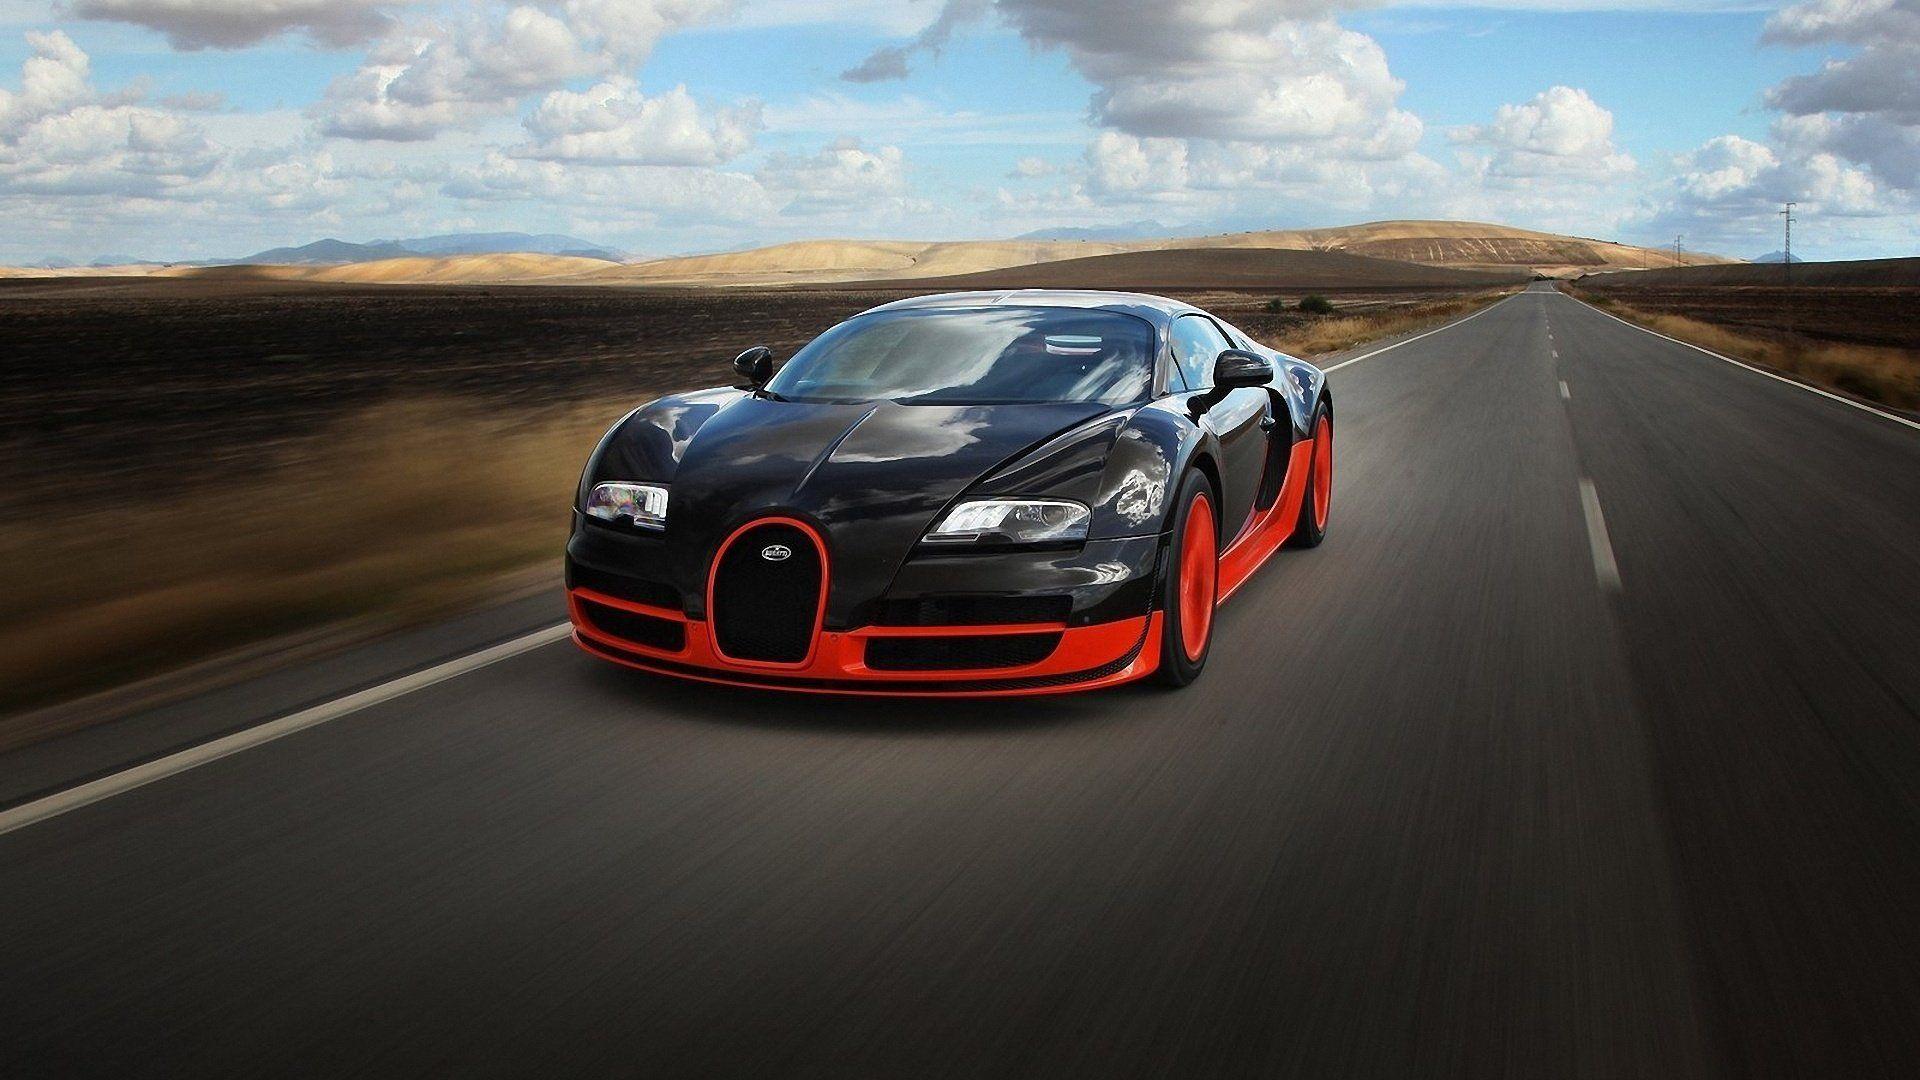 Bugatti Veyron Super Sport Wallpaper Hd Wallpaper Bugatti Veyron Super Sport Bugatti Veyron Bugatti